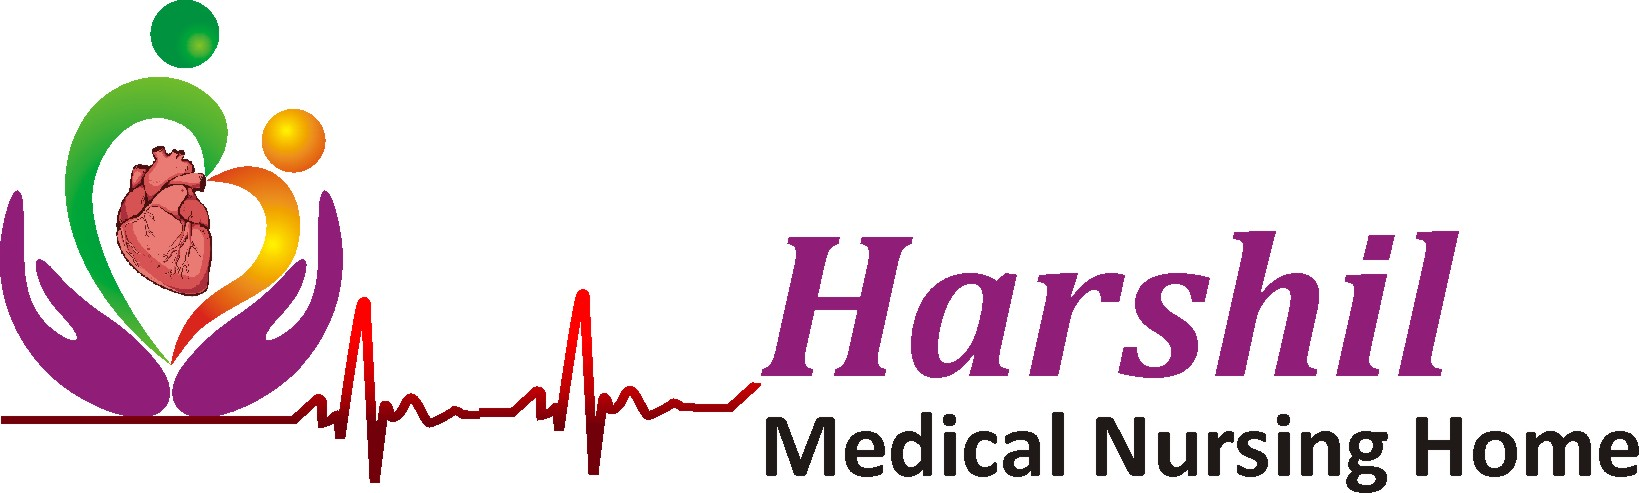 Harshil Medical Nursing Home